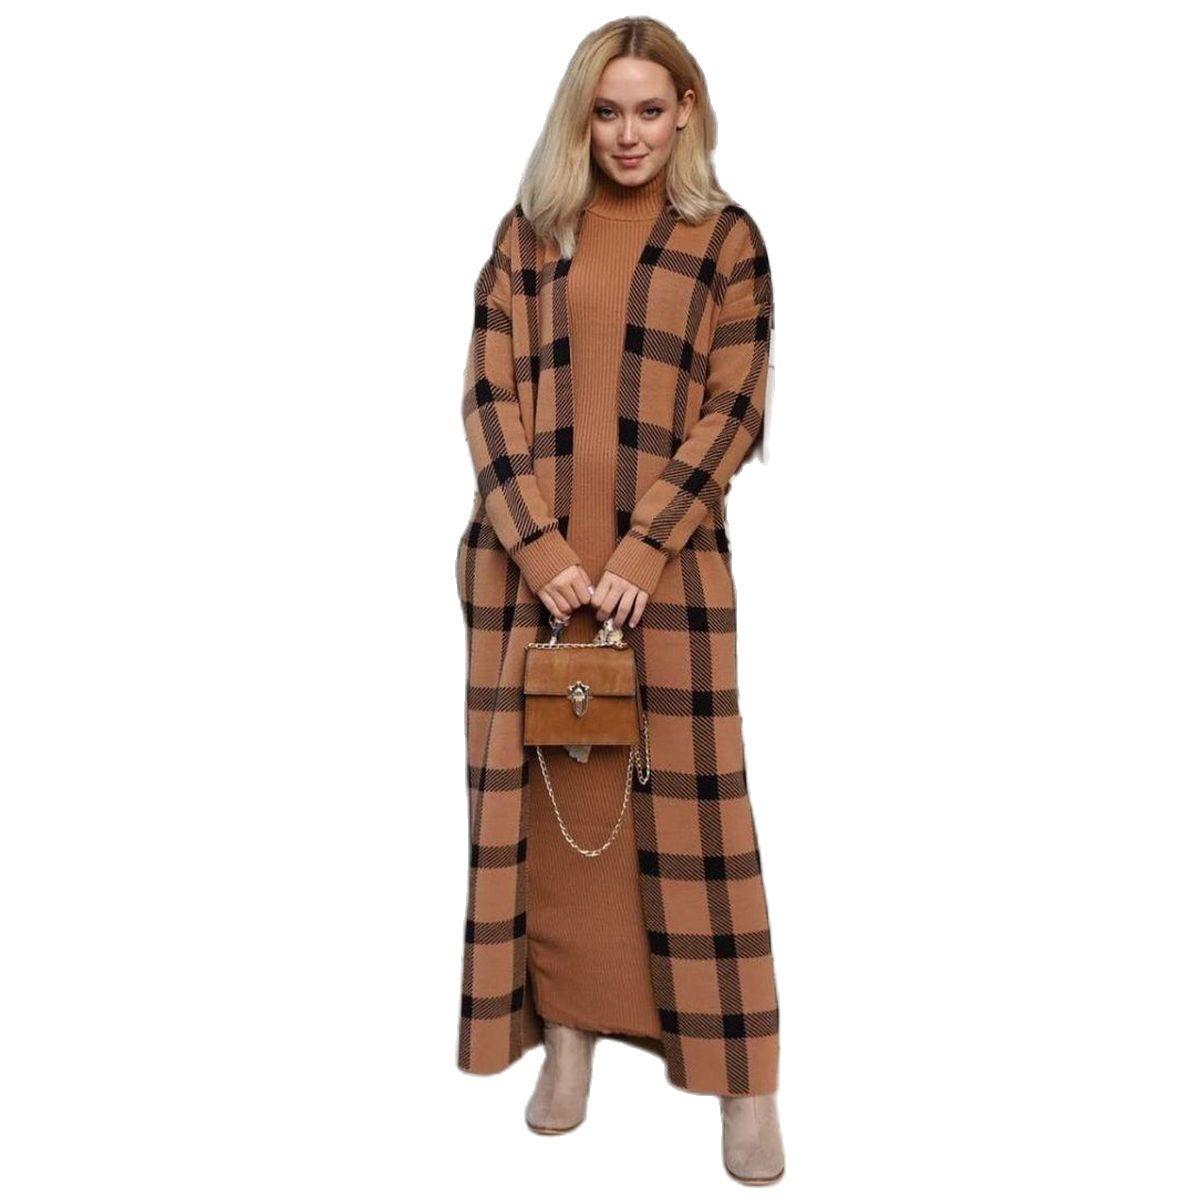 2 Pieces Square Pattern Turtleneck Women's Set, Maxi Dress and Cardigan Suit Islamic Fashion Muslim Clothing Turkey Dubai 2021